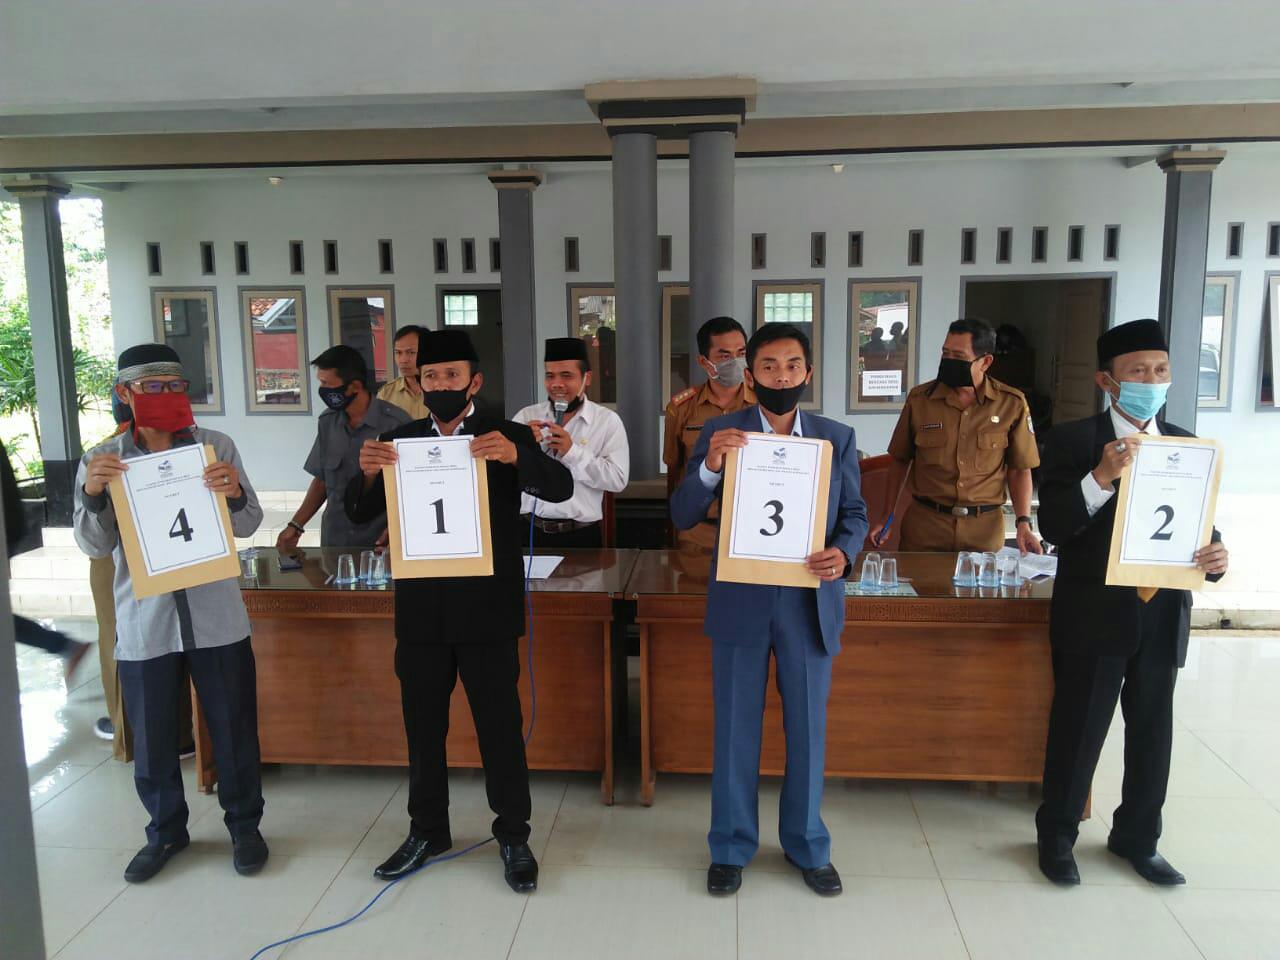 calon kepala desa dayeuhluhur 2020 - 2026, Desa Dayeuhluhur, Kecamatan Jatinagara, Kabupaten Ciamis, Jawa Barat, Kepala Desa Dayeuhluhur,